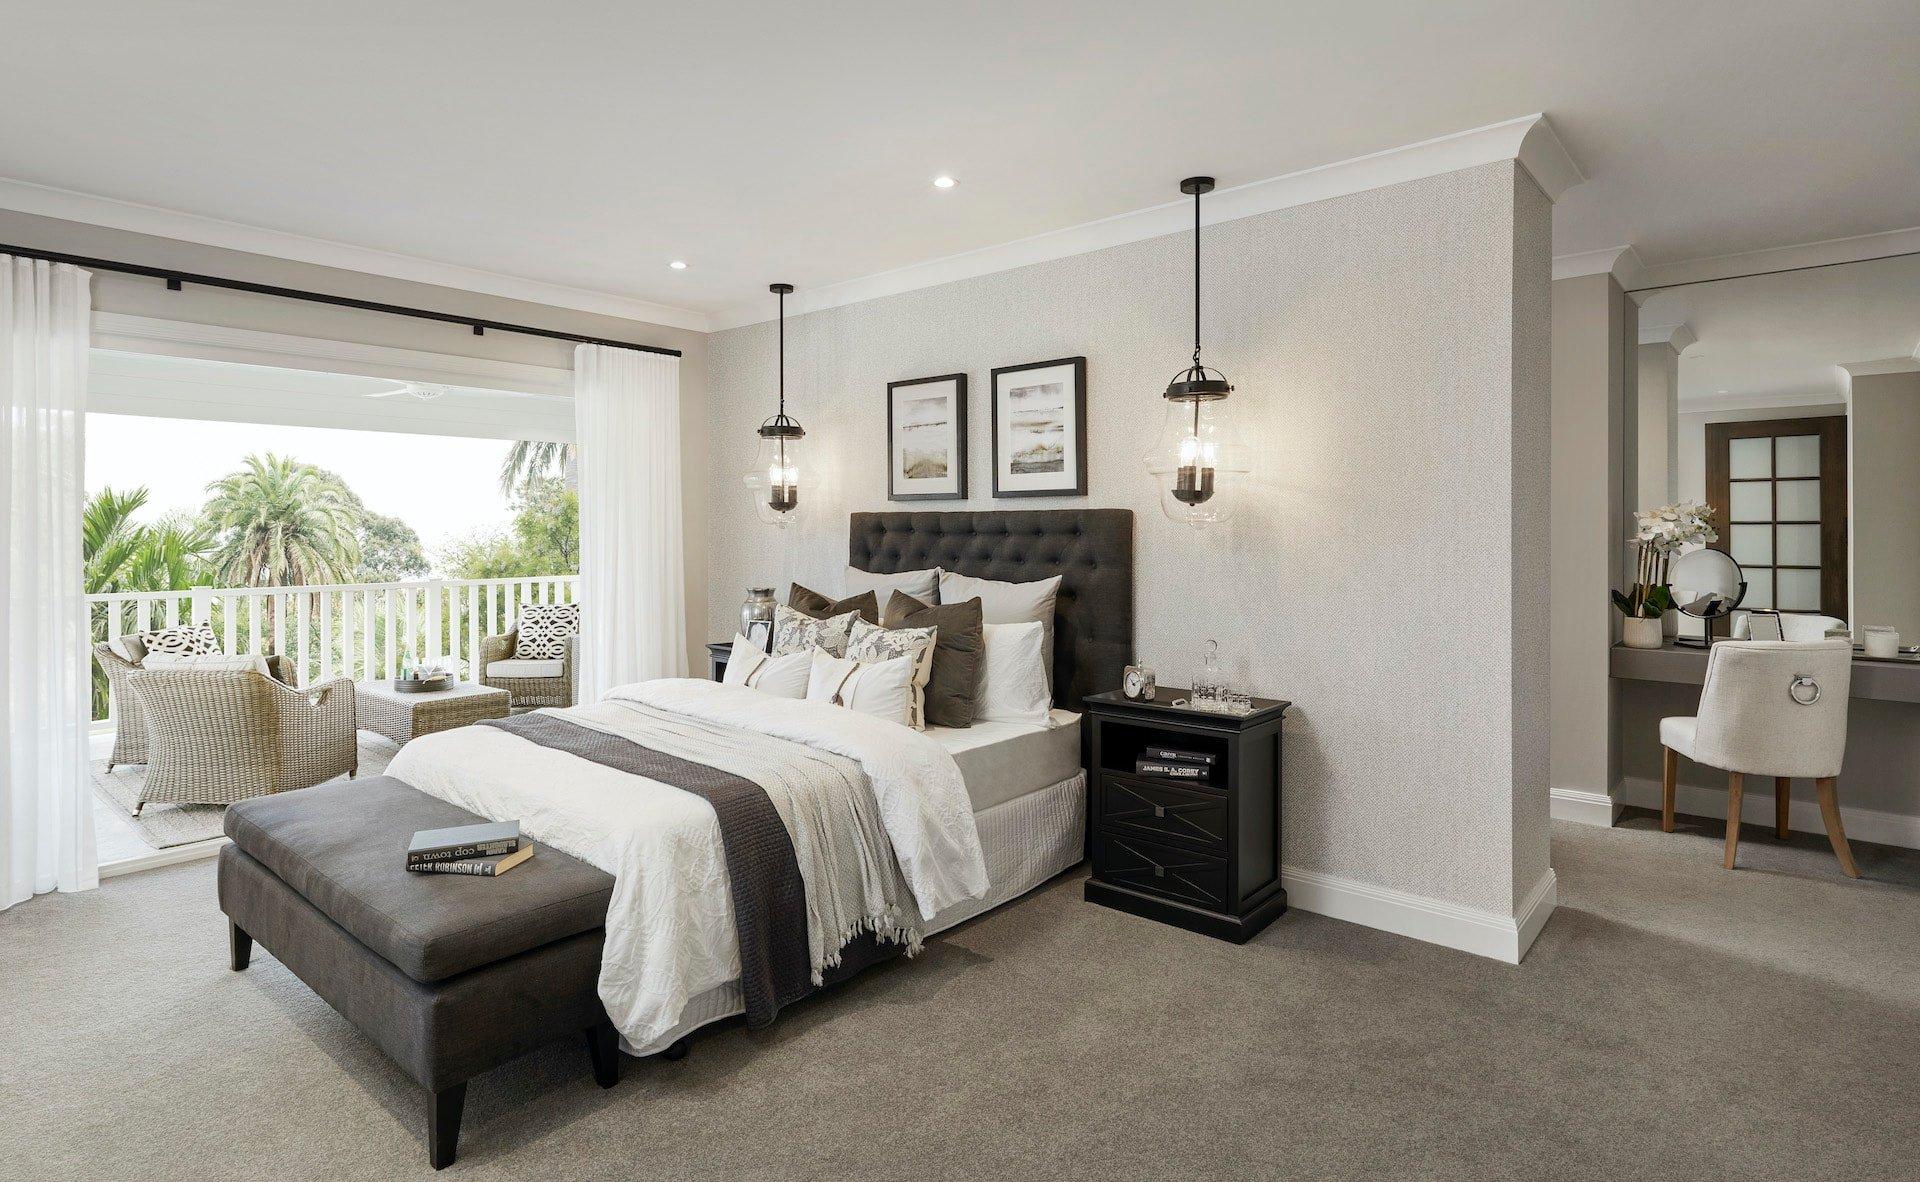 modern provincial master bedroom design with dark grey upholstered bedhead and industrial pendant lights